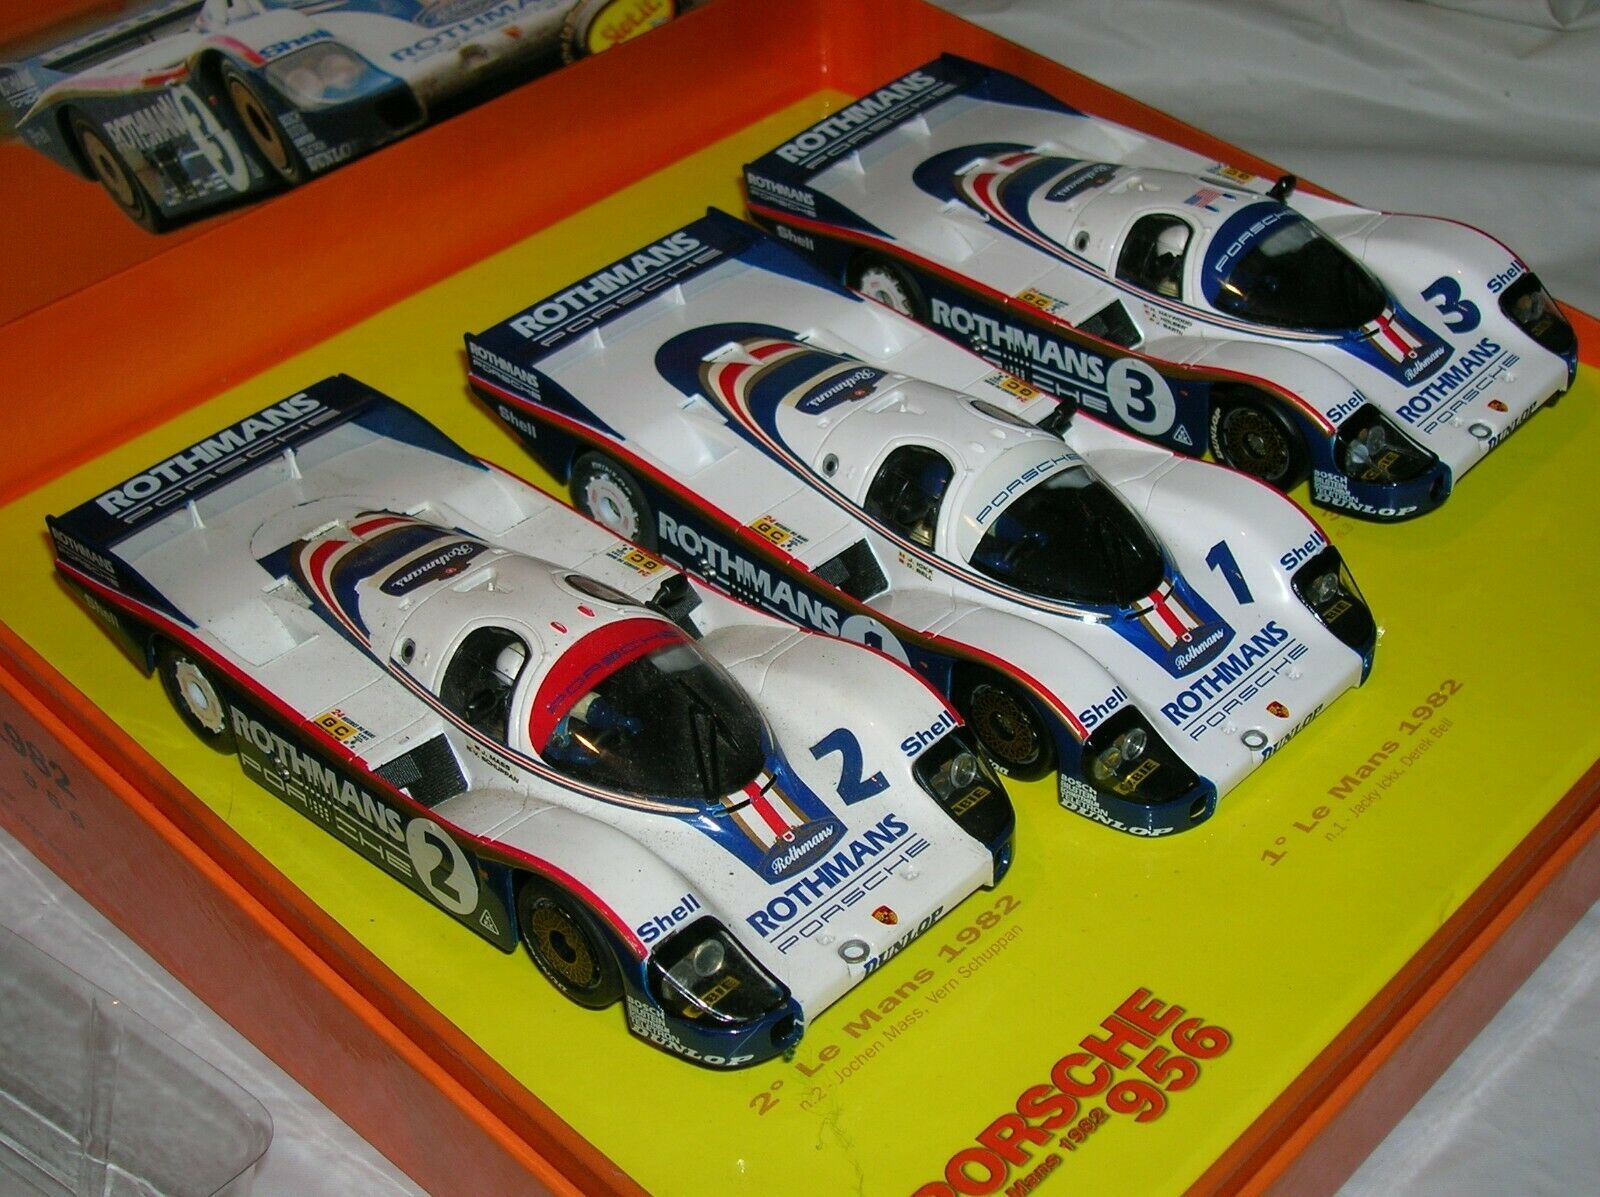 Le Mans '82 Porsche 1st 2nd 3rd place cars Rothmans  - appear mint in box $89.95